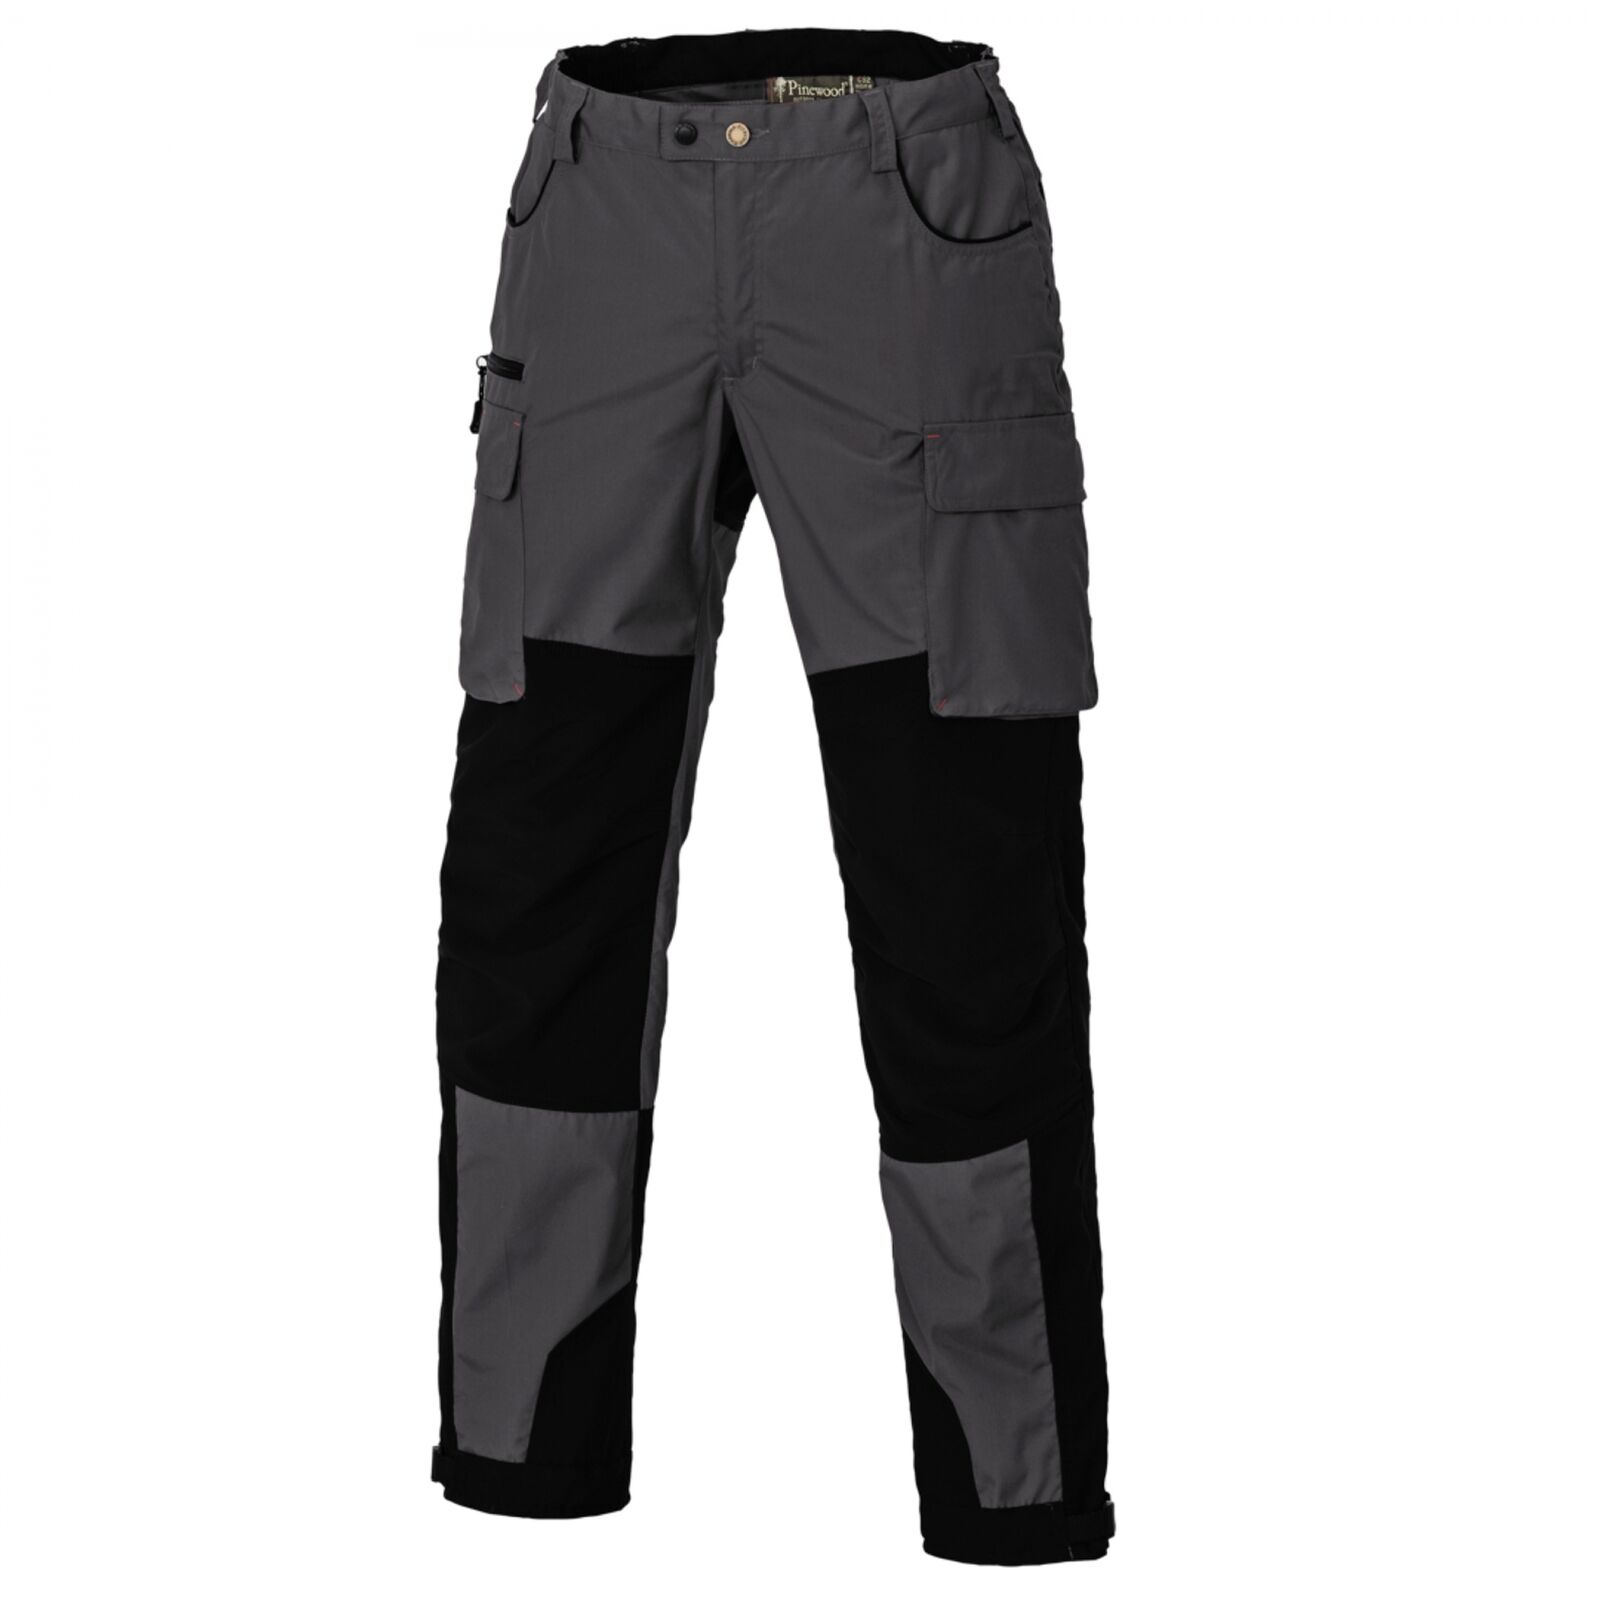 Pinewood Dog-Sports outdoor-, senderismo-, trekking pantalones gris oscuro negro mujer